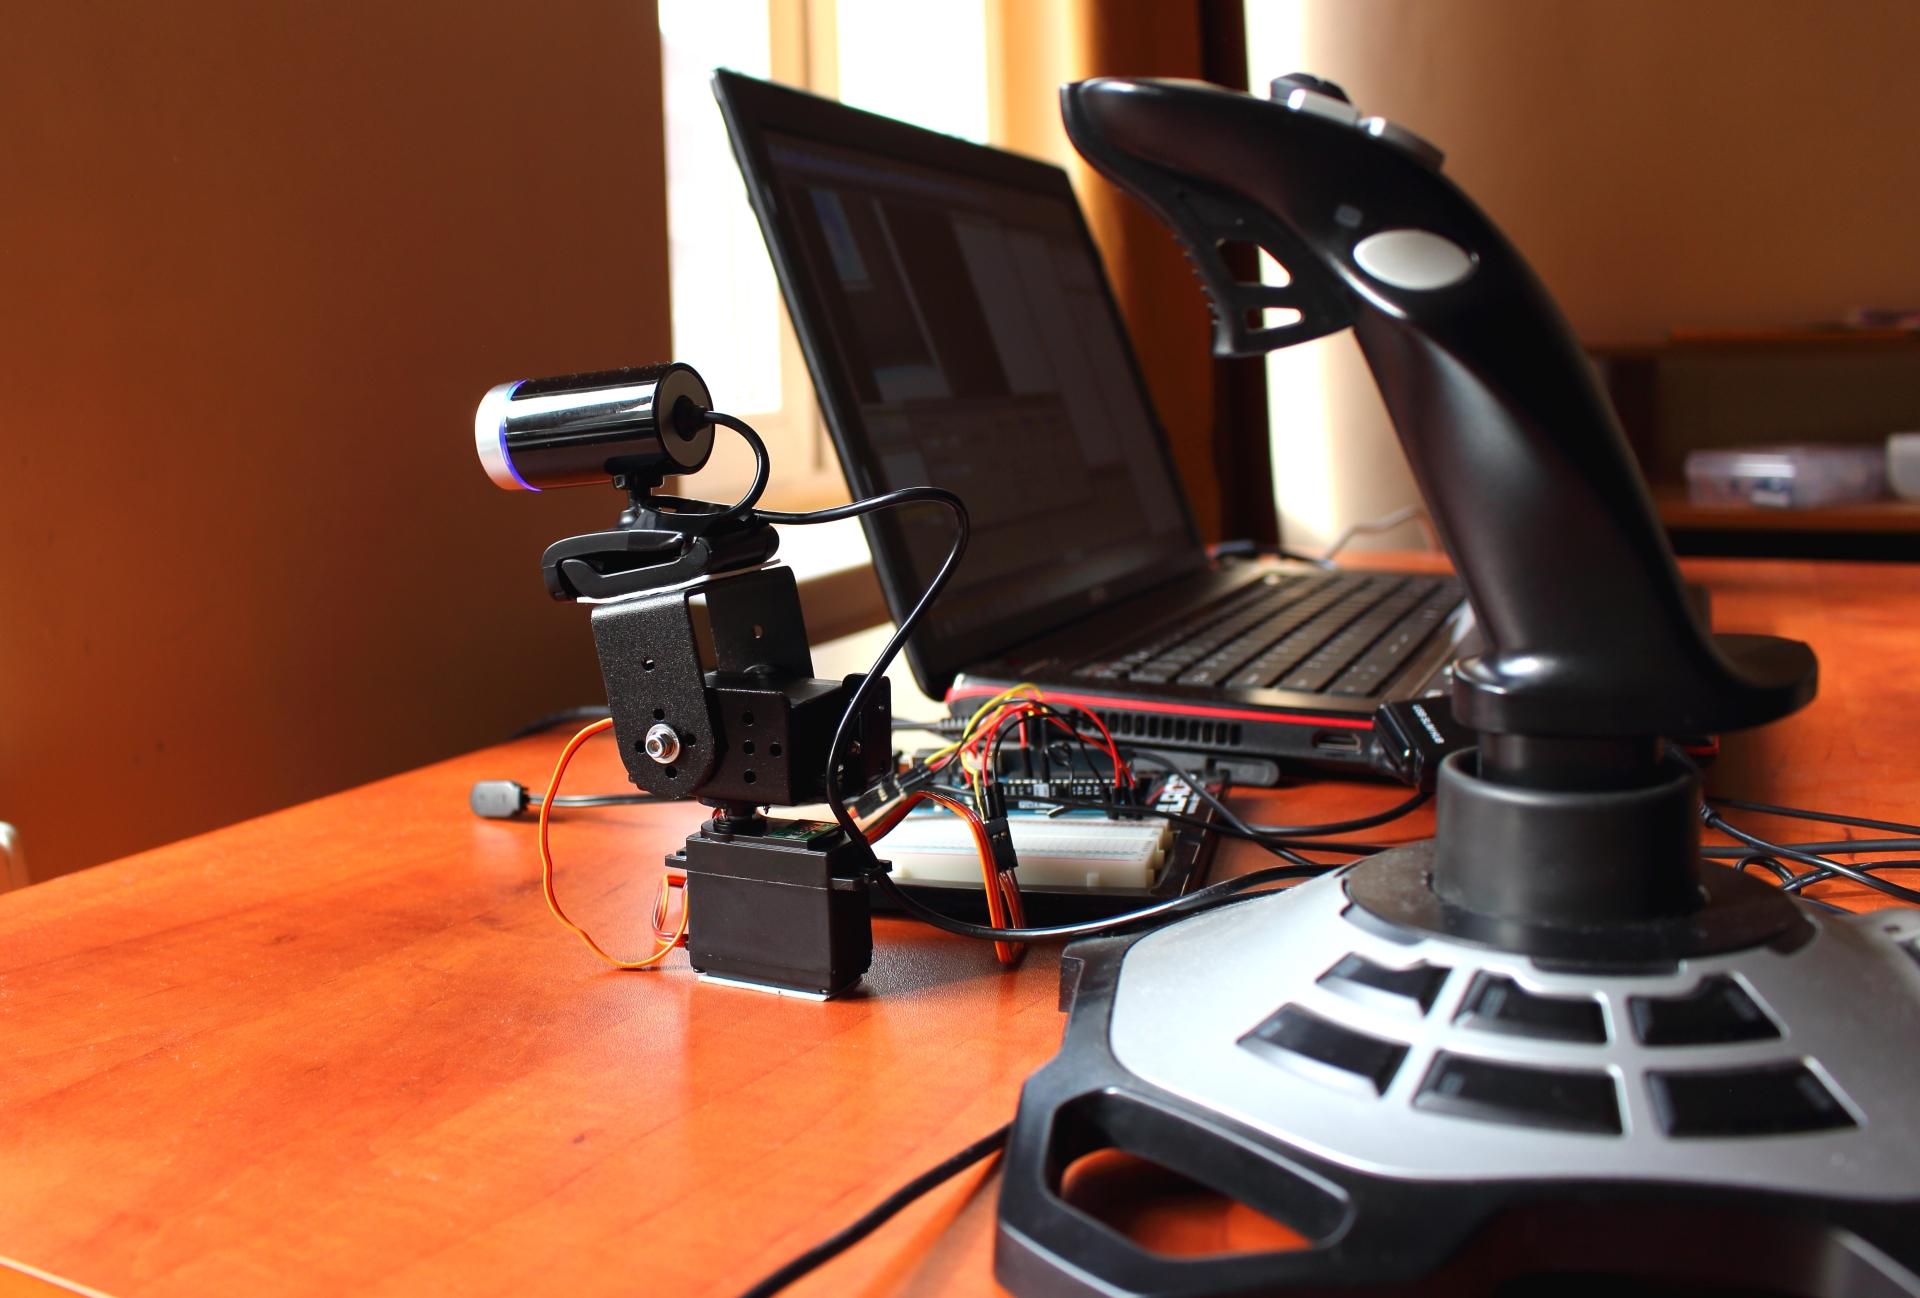 Oob moving webcam with joystick and servos arduino